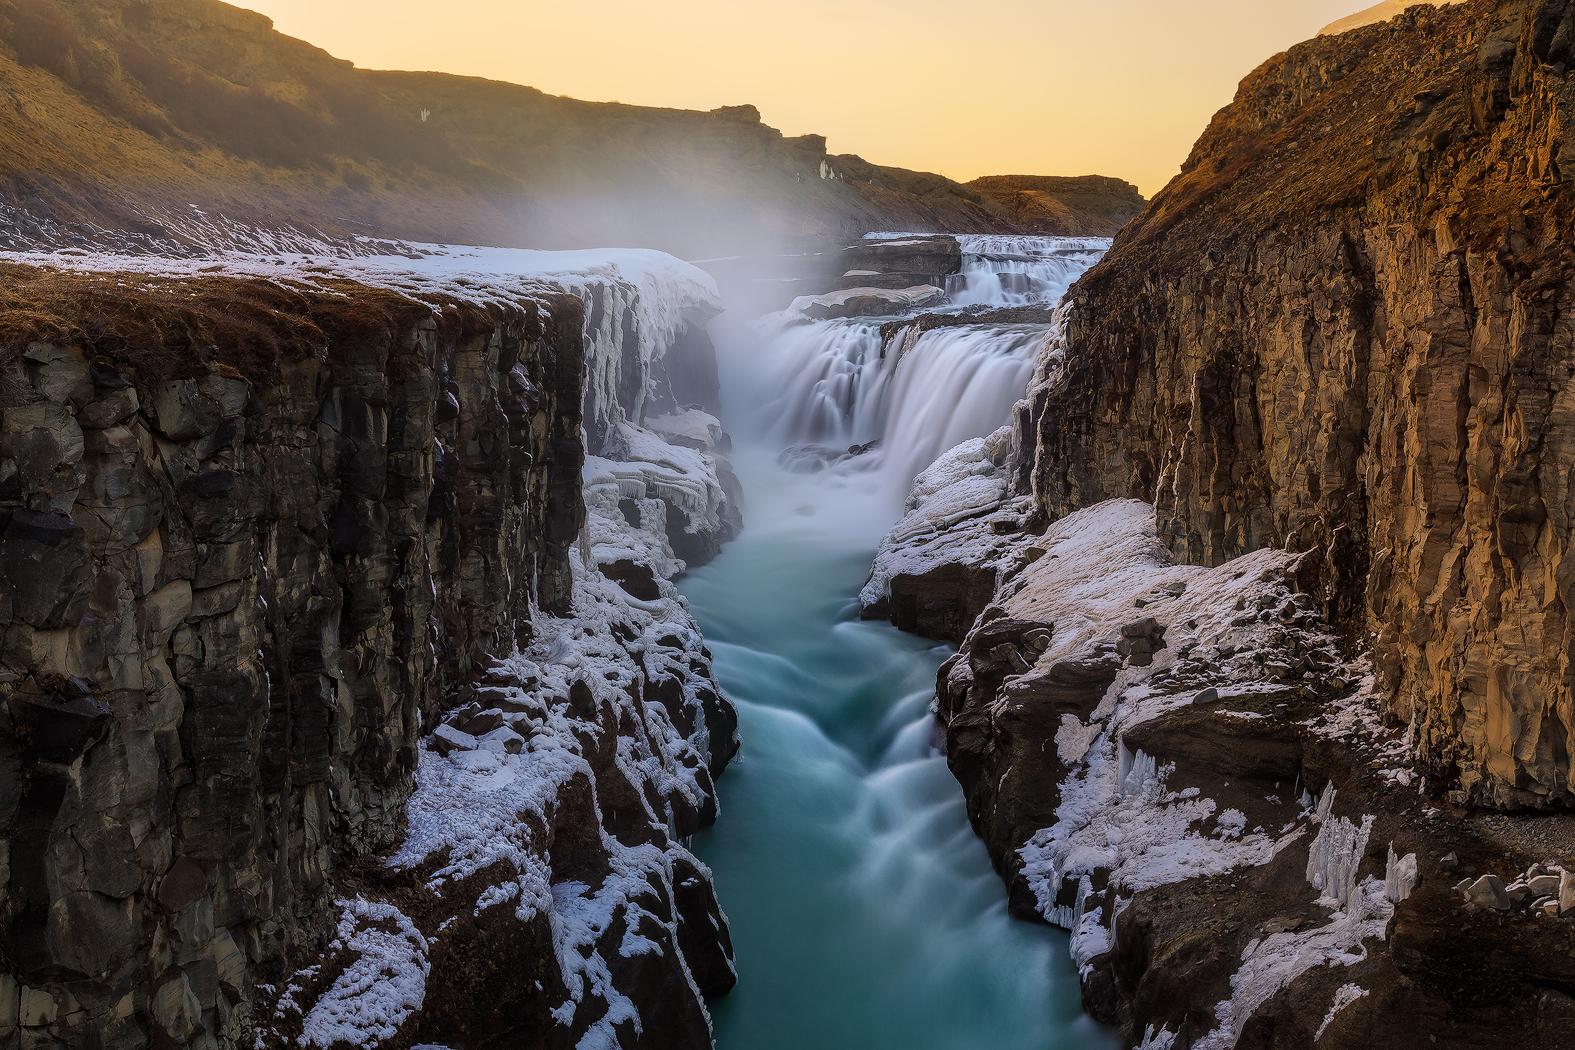 Gullfoss-vandfaldet har to fald, der rammer den dybe kløft under det.